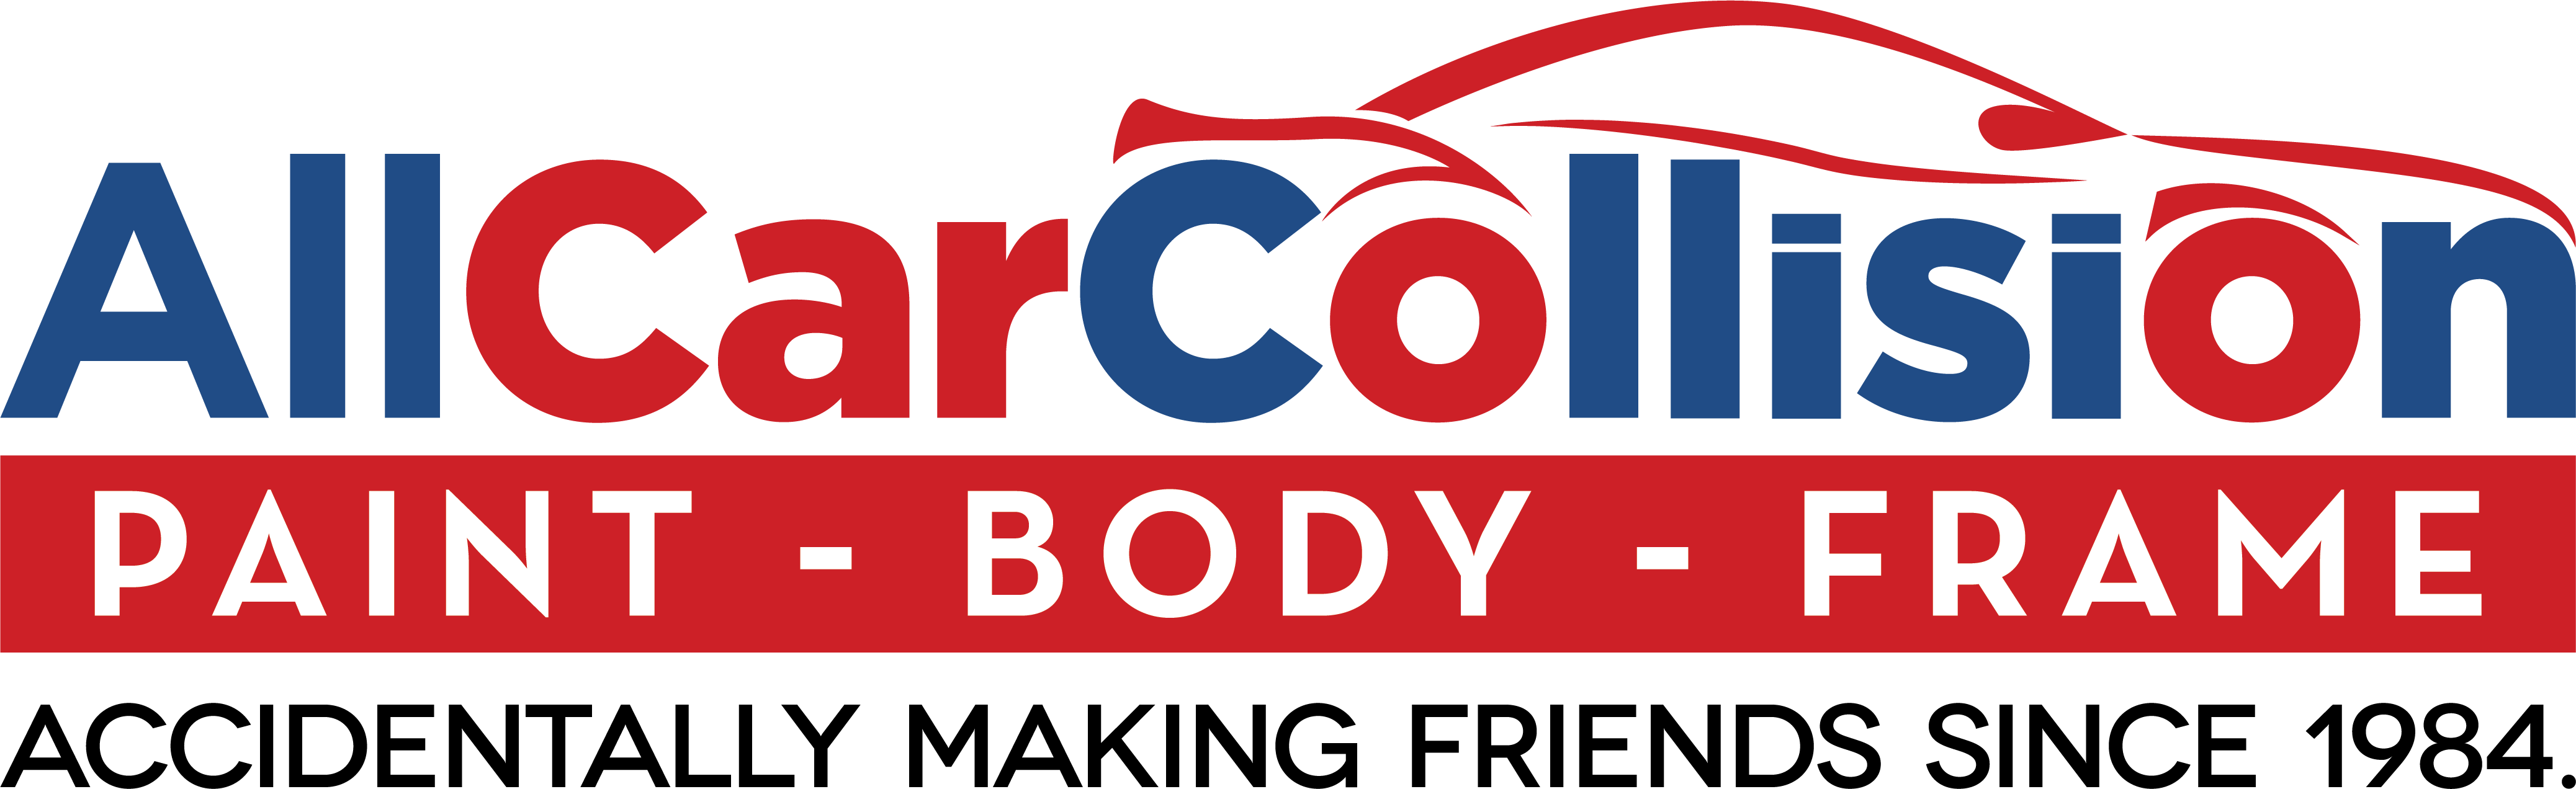 ALL CAR COLLISION, Inc.